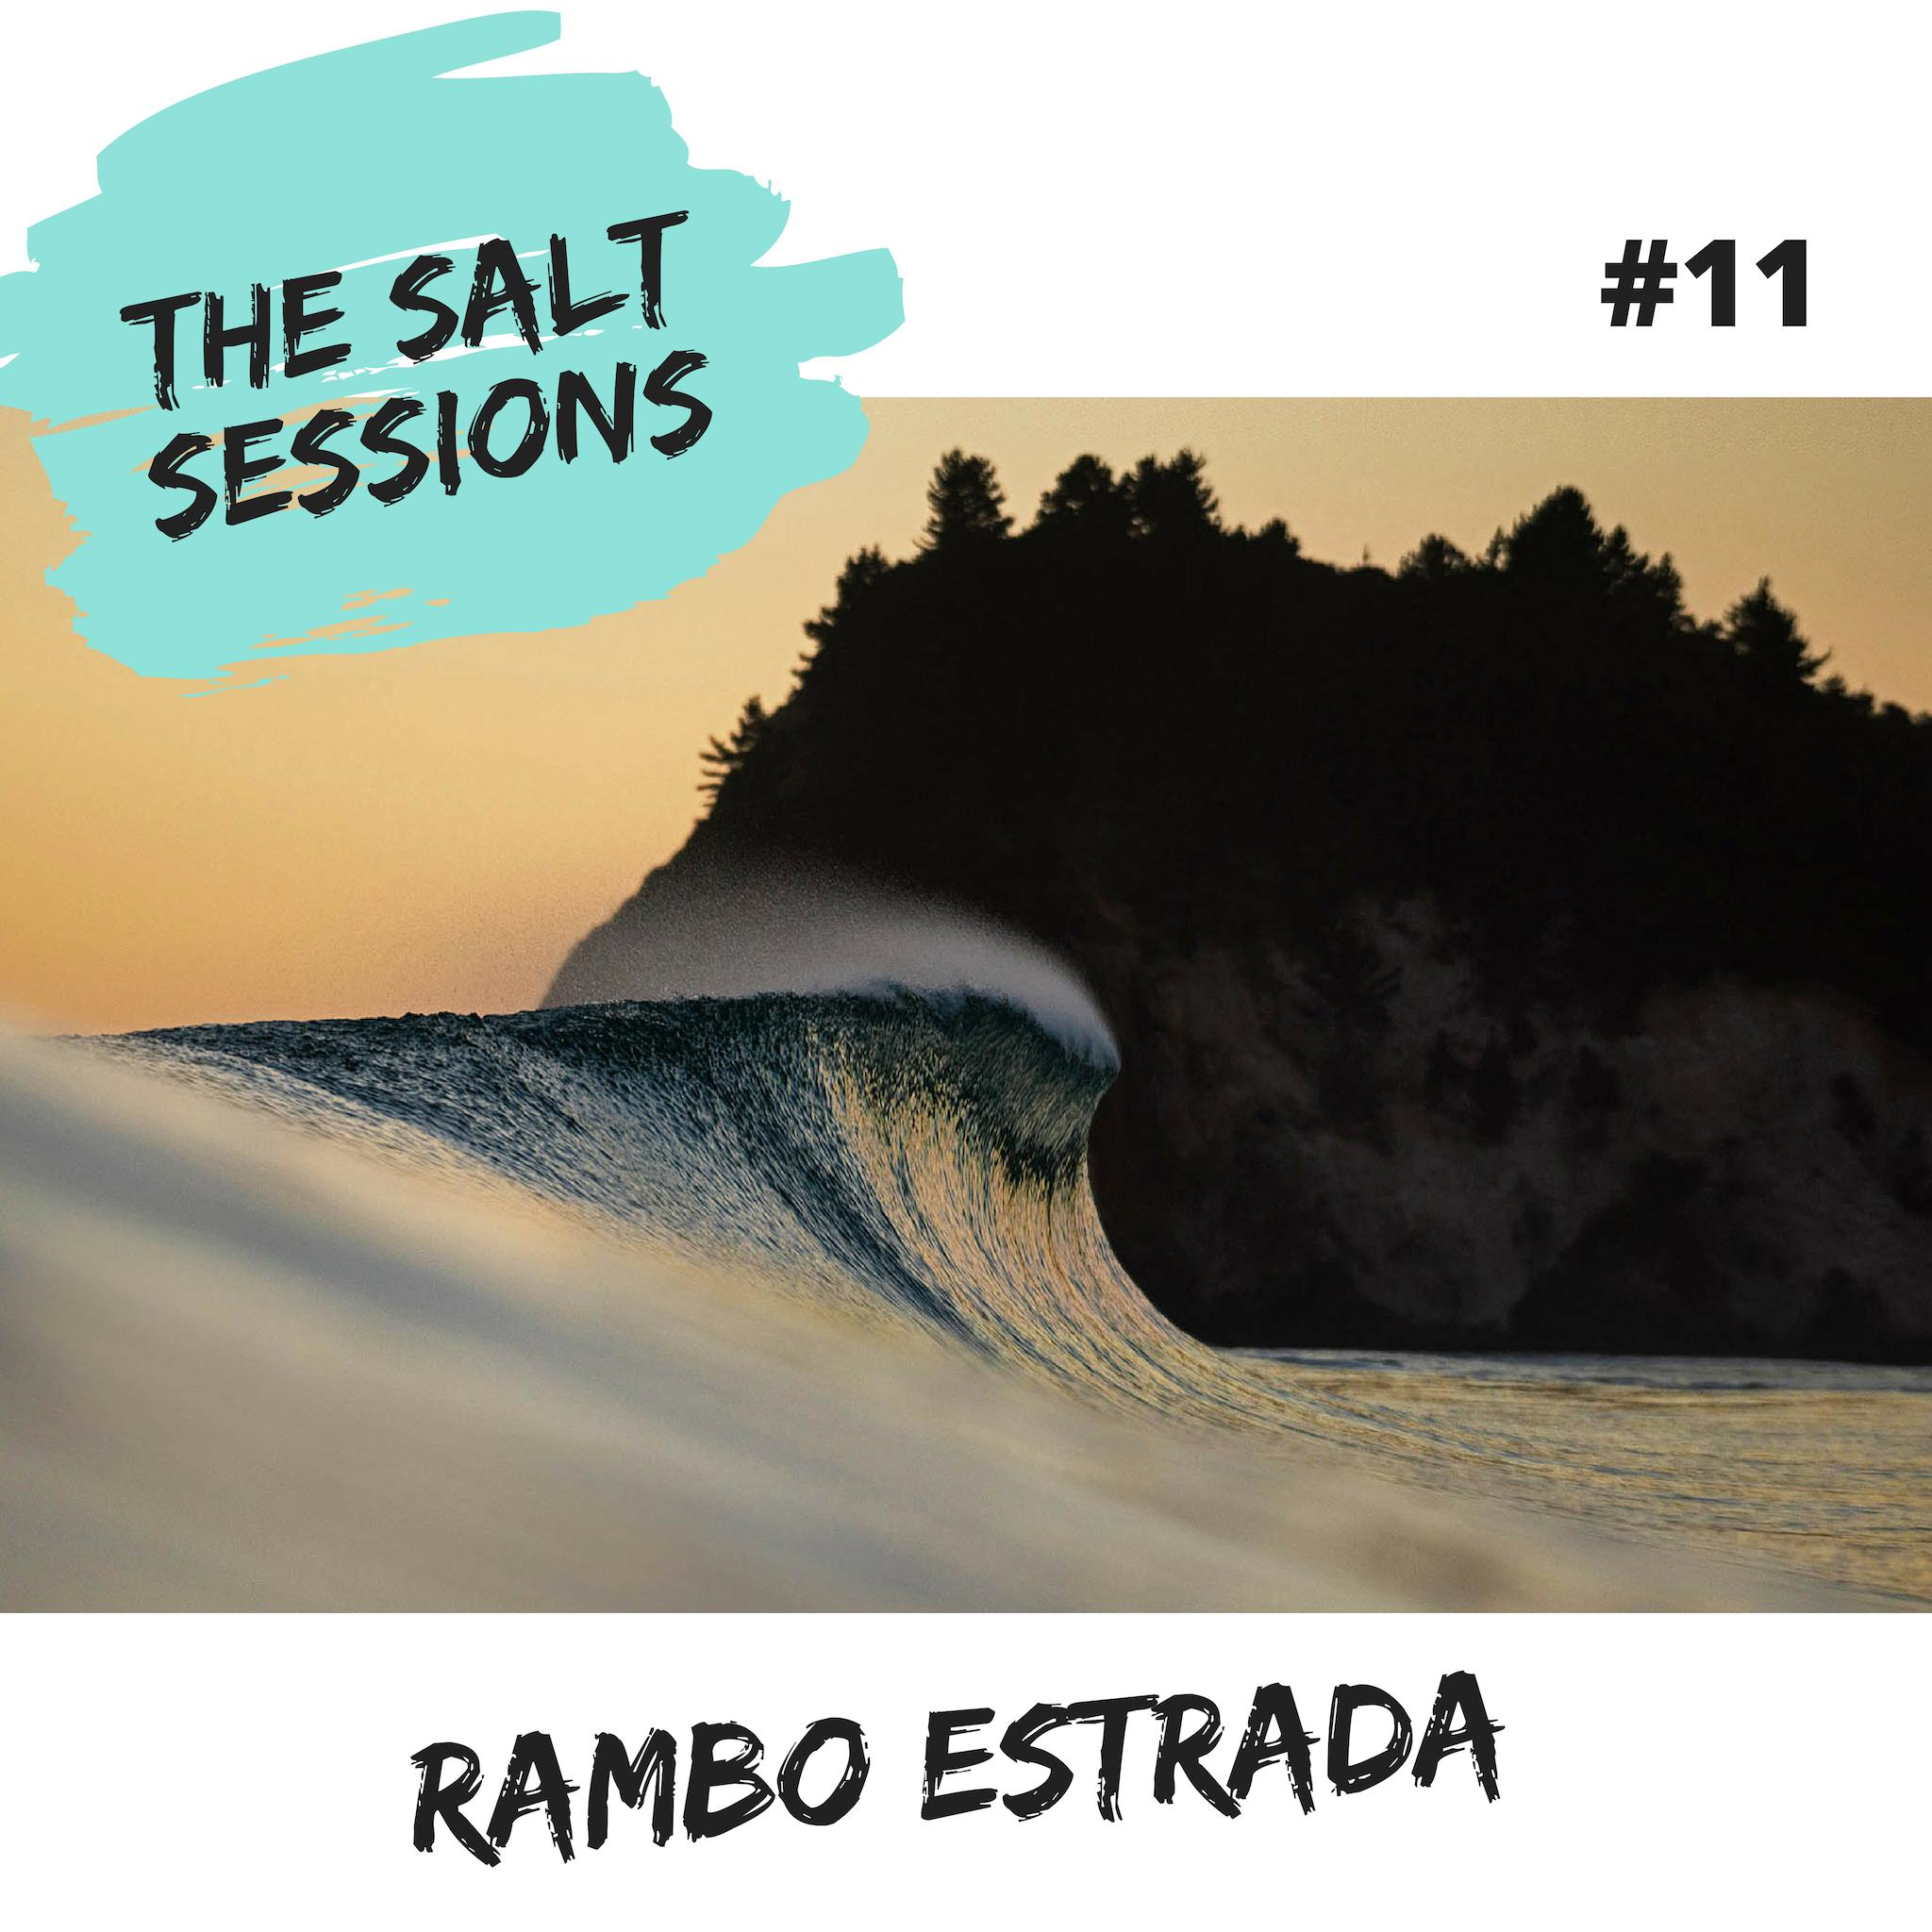 Rambo_Estrada_IG_Post.jpg